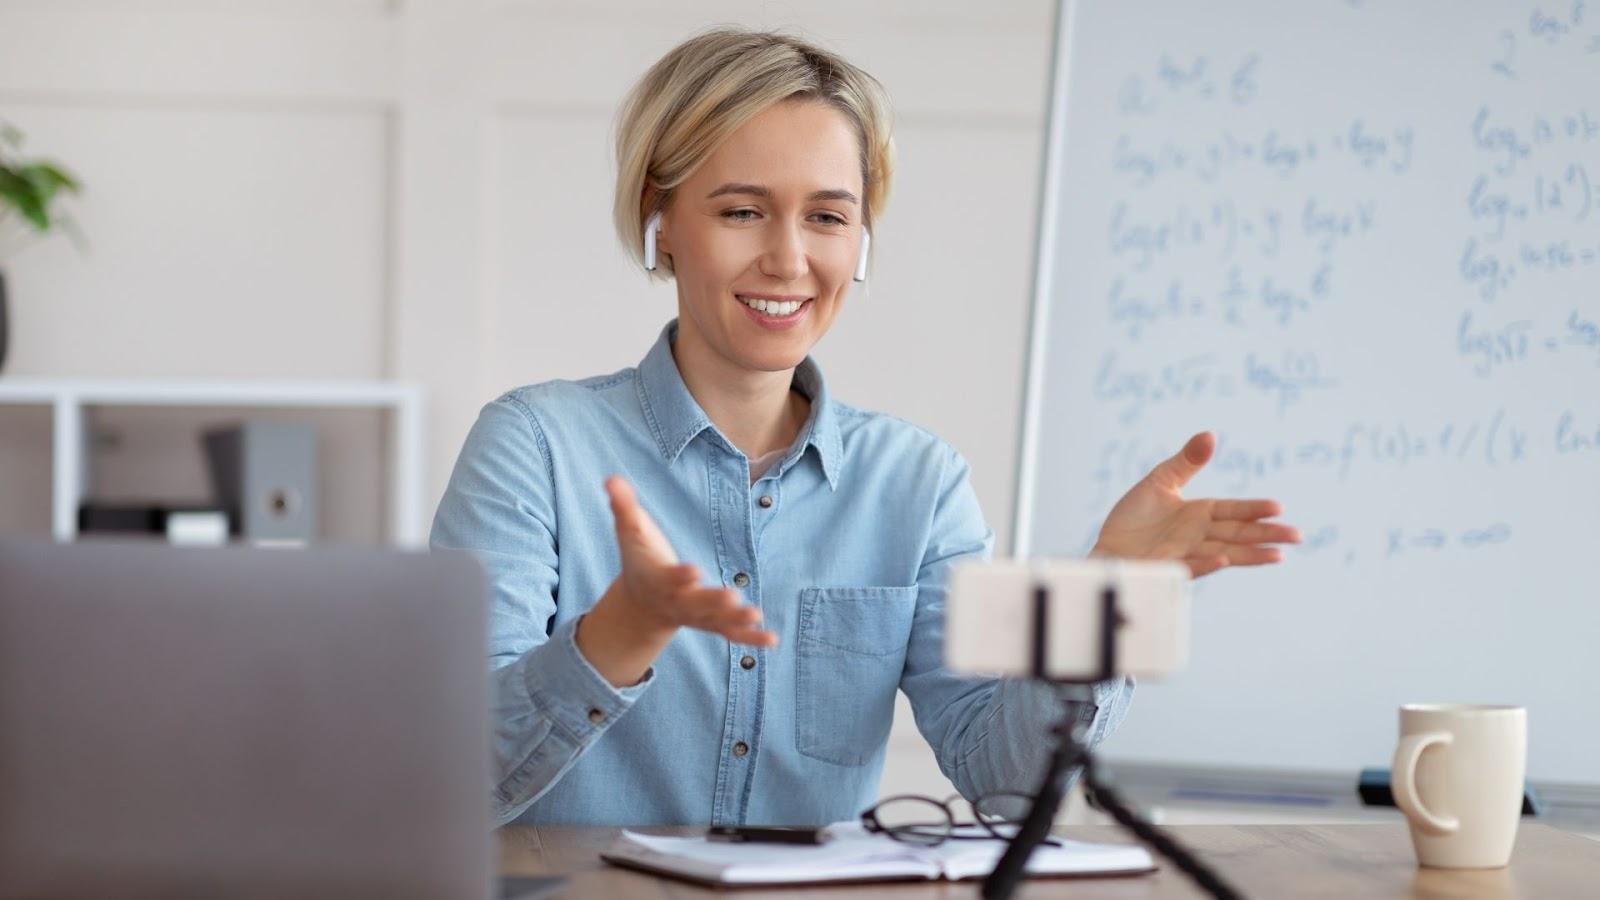 online math tutoring session